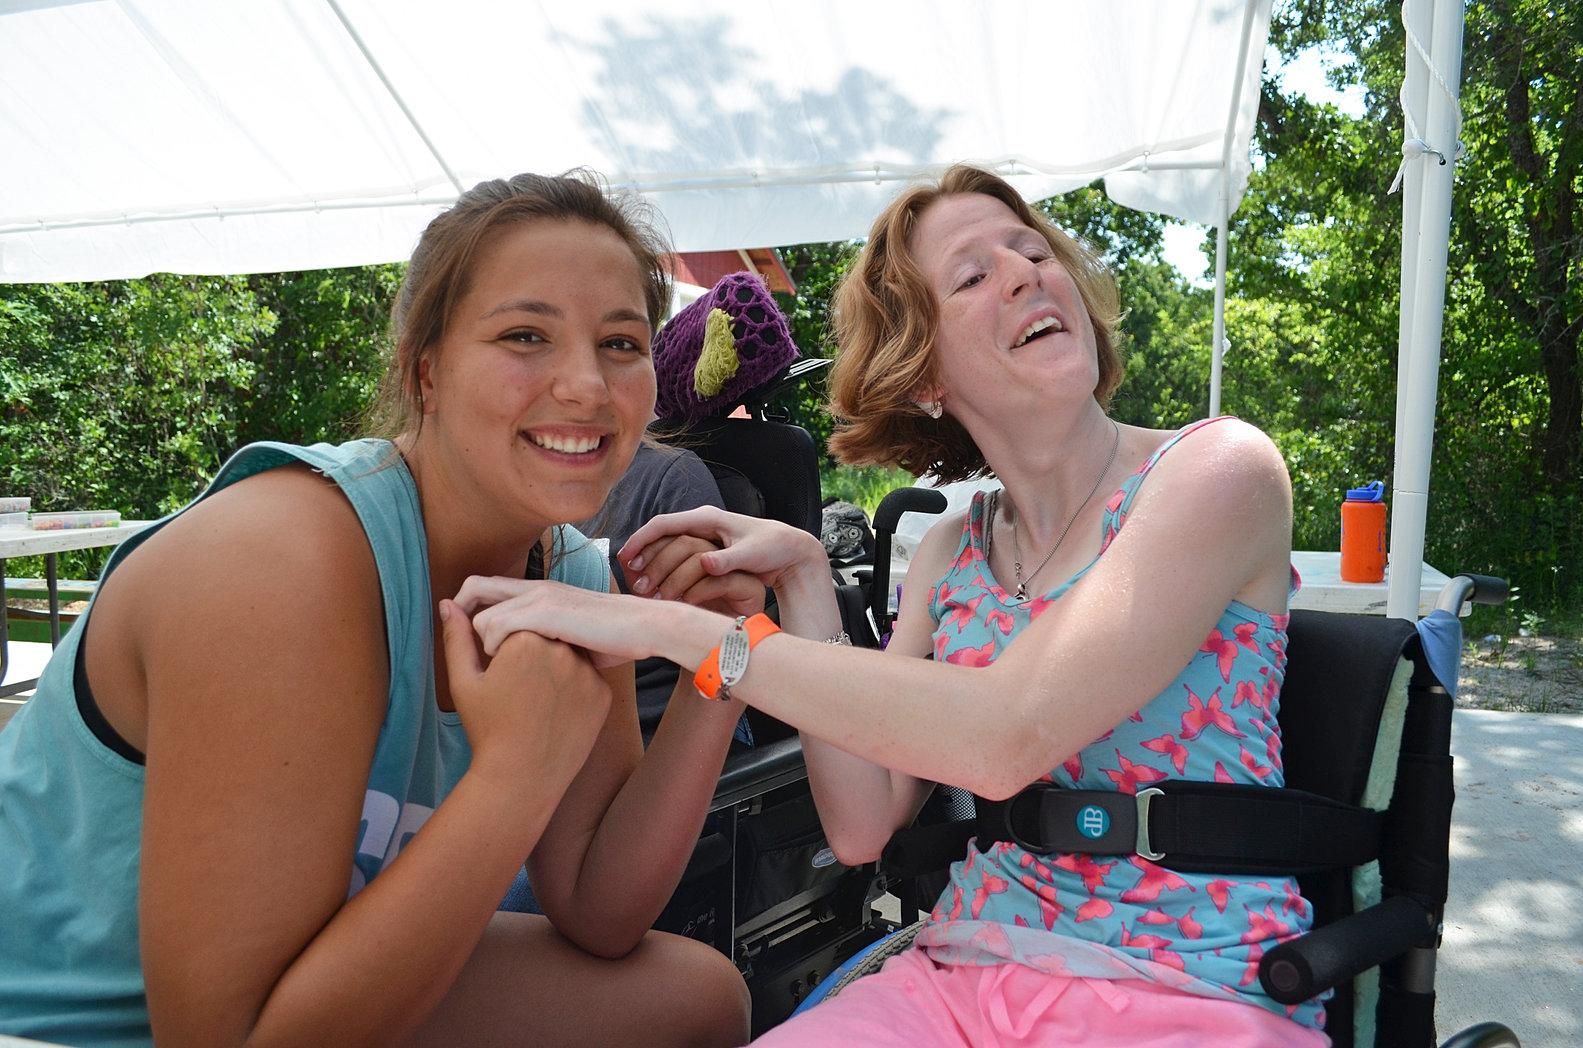 camp summit seasonal jobs giving back